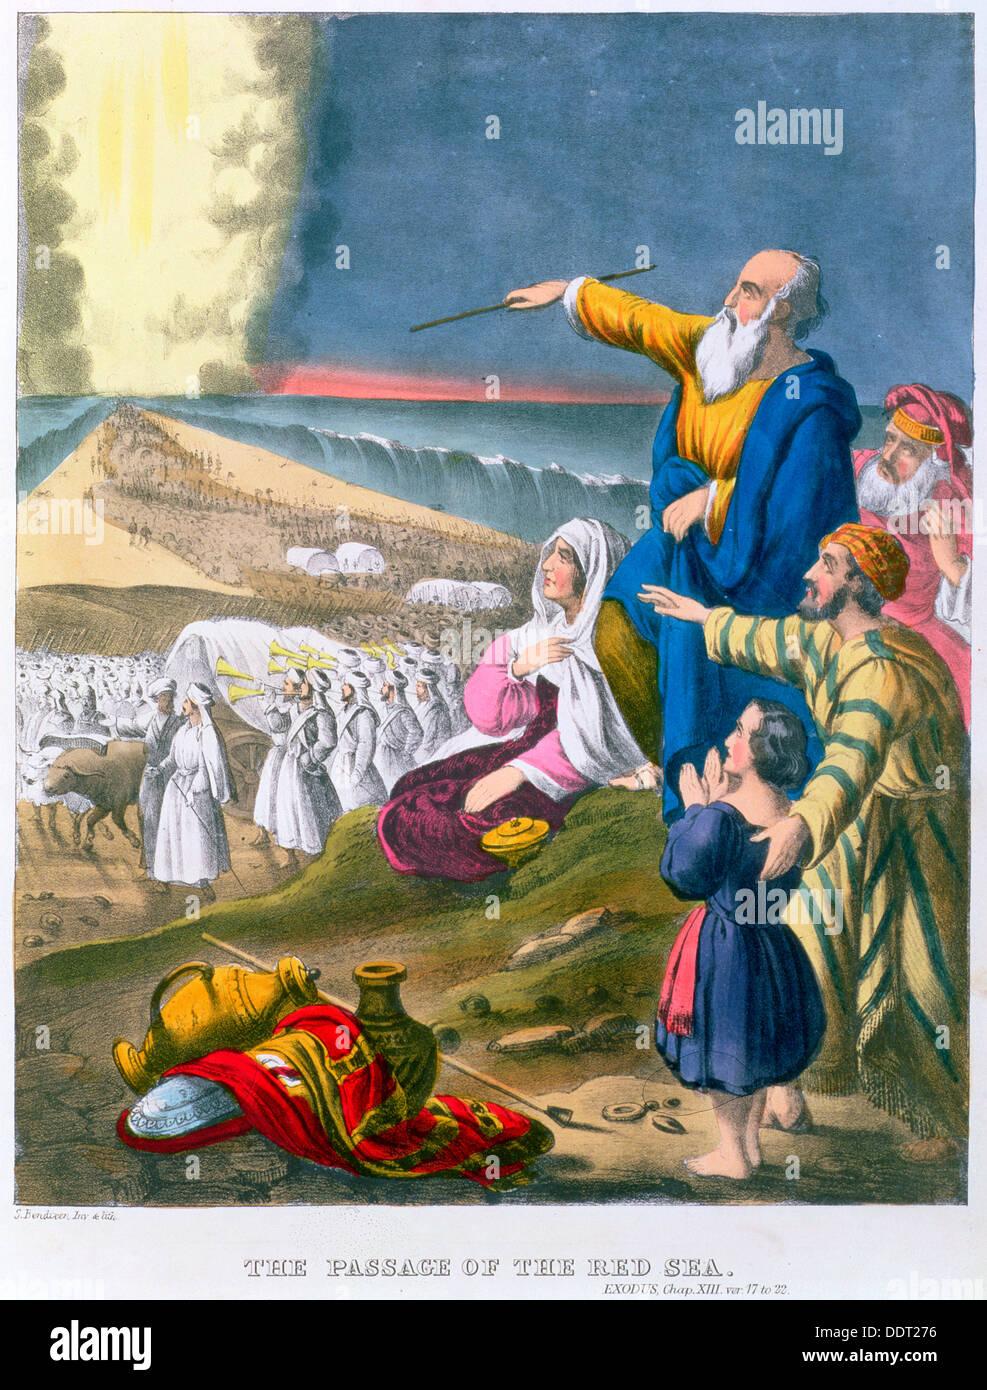 Moisés partiendo del Mar Rojo, 1870. Artista: Siegfried Detlev Bendixen Imagen De Stock